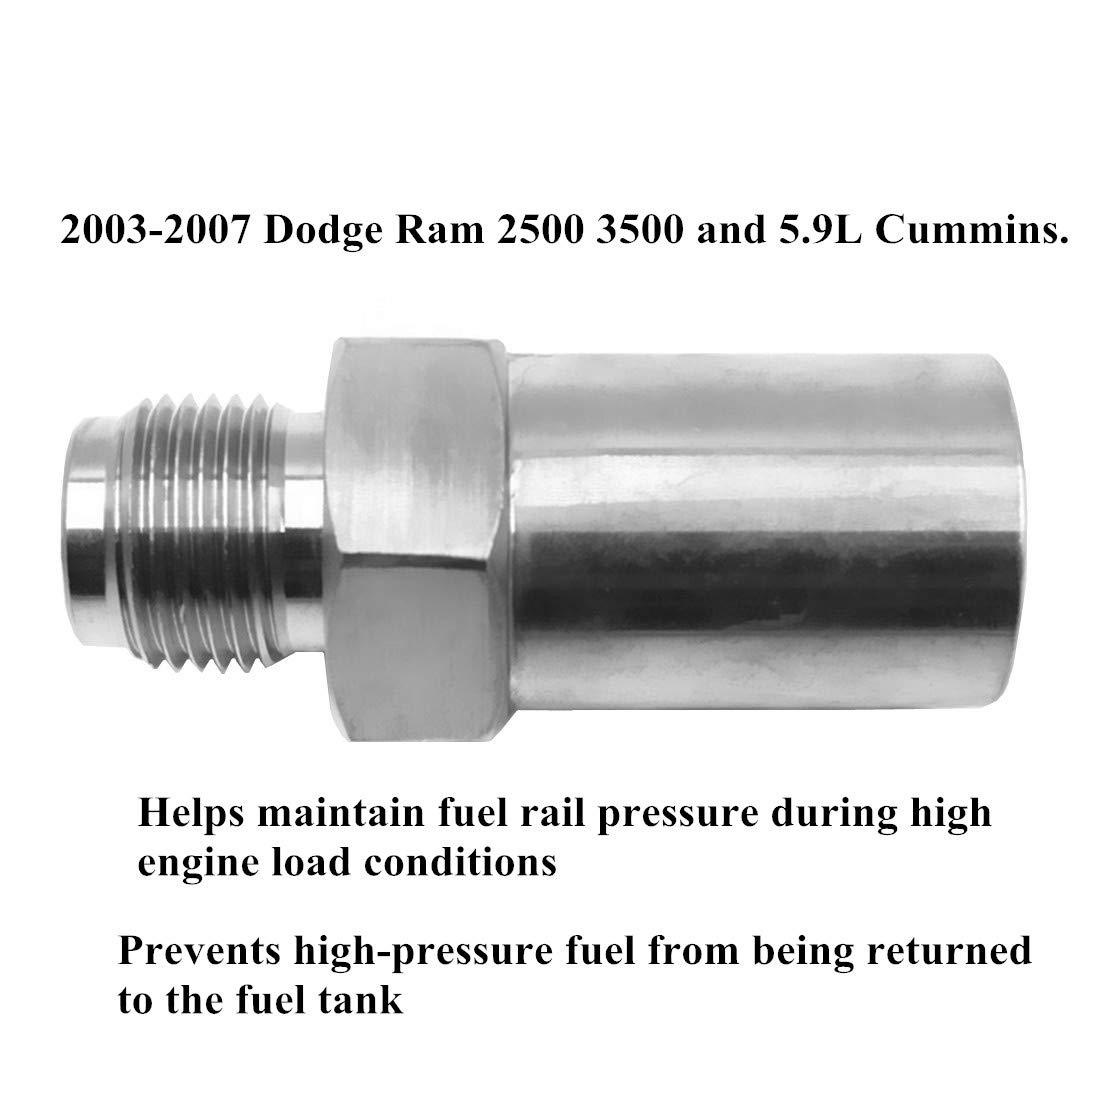 1050070 for 2003-2007 Dodge Ram 2500 3500 5.9L Cummins DEF Fuel Injector Common Rail Fuel Plug